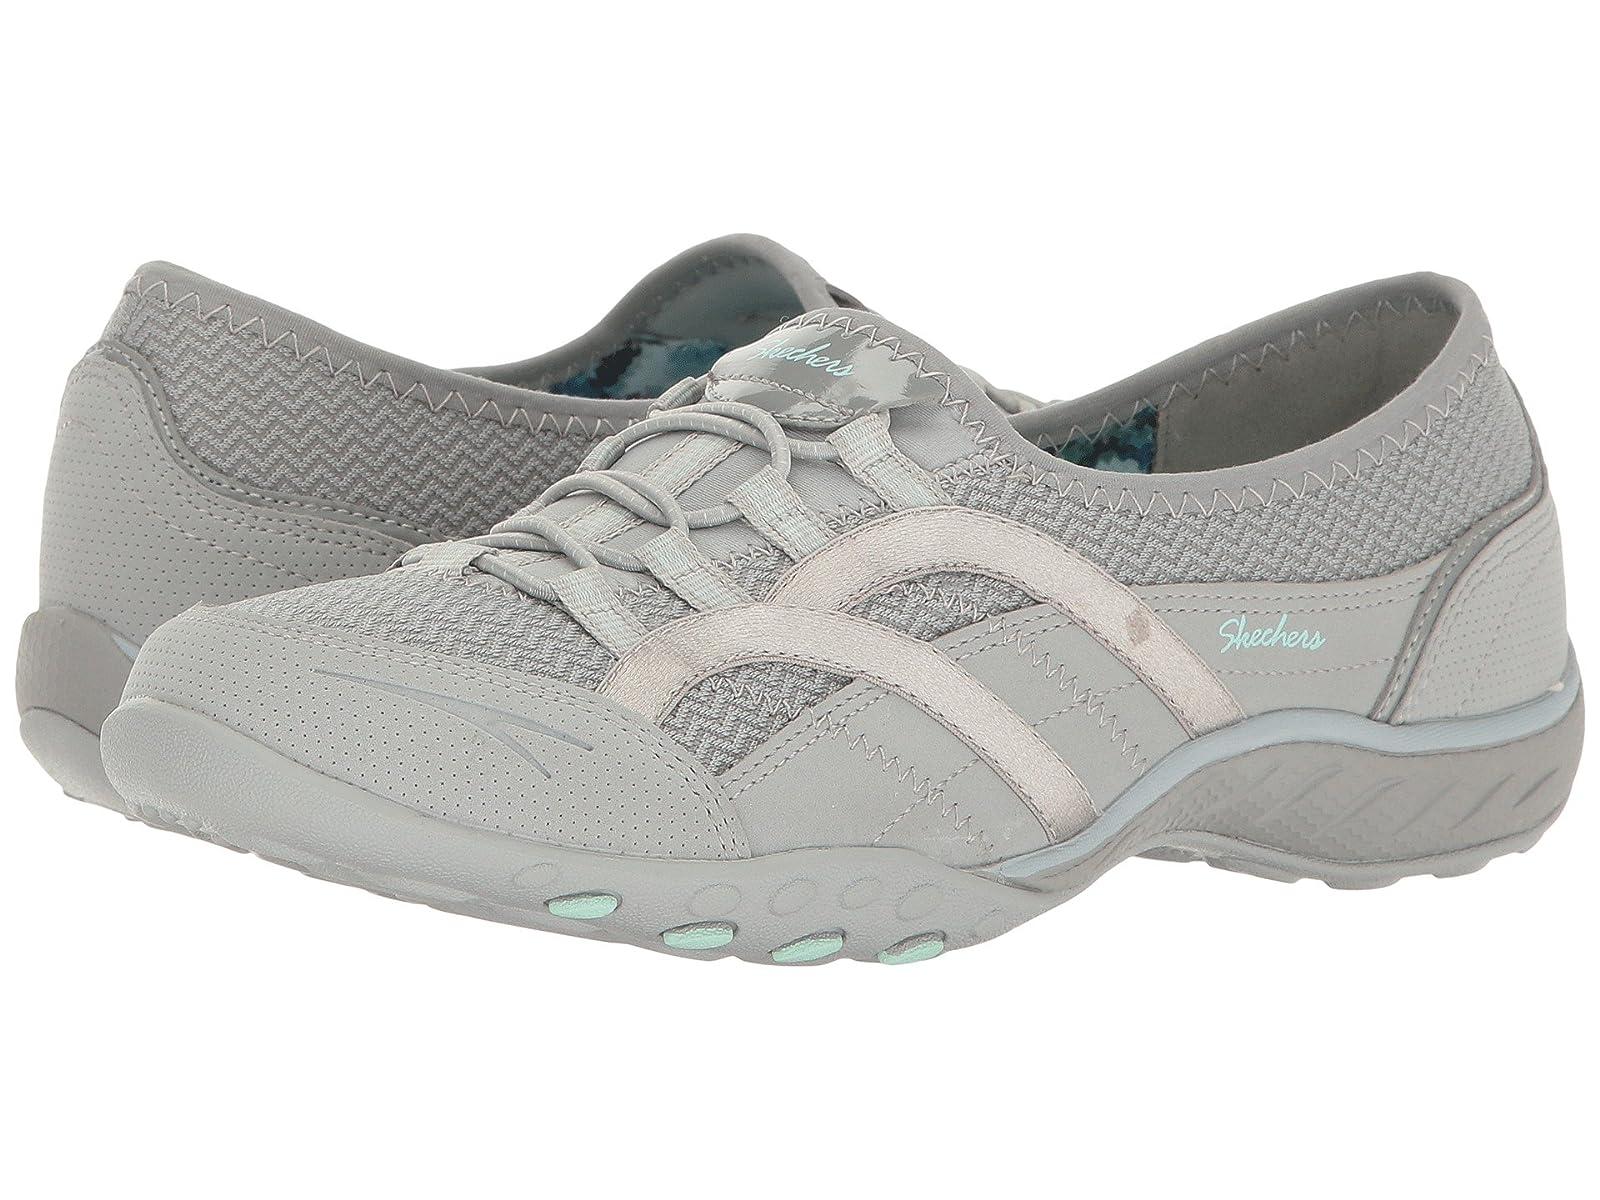 SKECHERS Breathe-Easy - FaithfulAtmospheric grades have affordable shoes